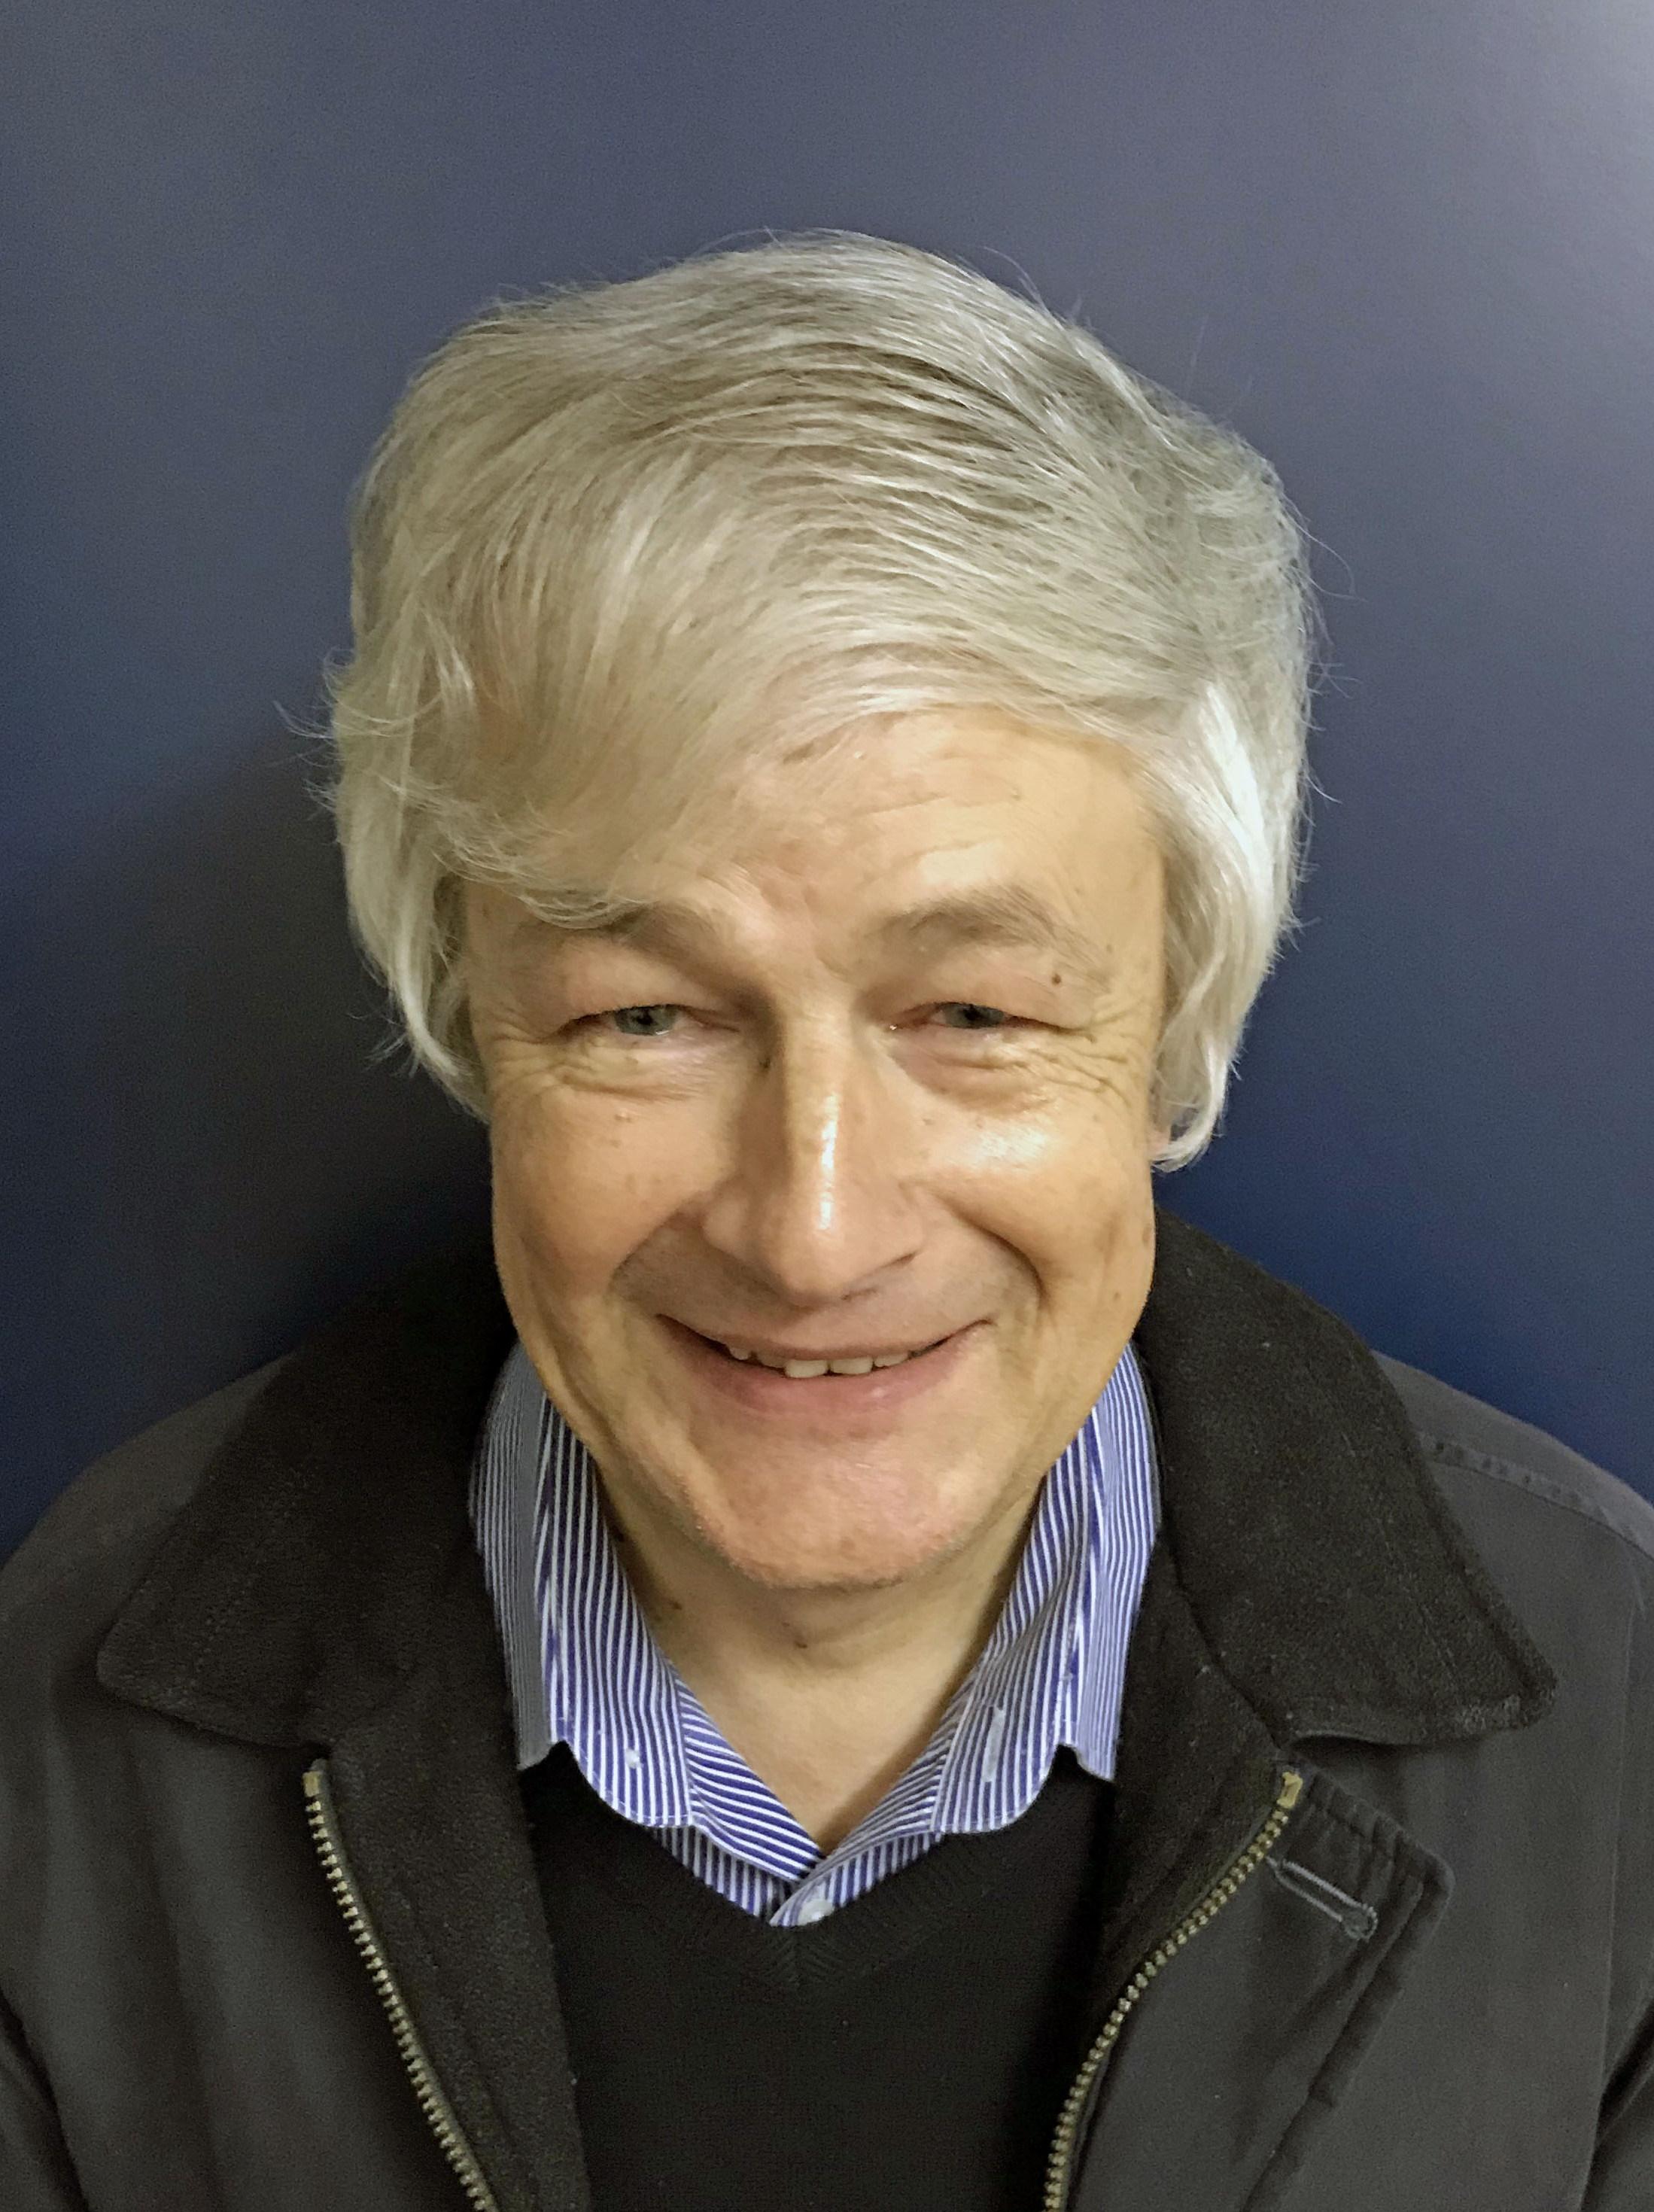 Bernhard Aegerter